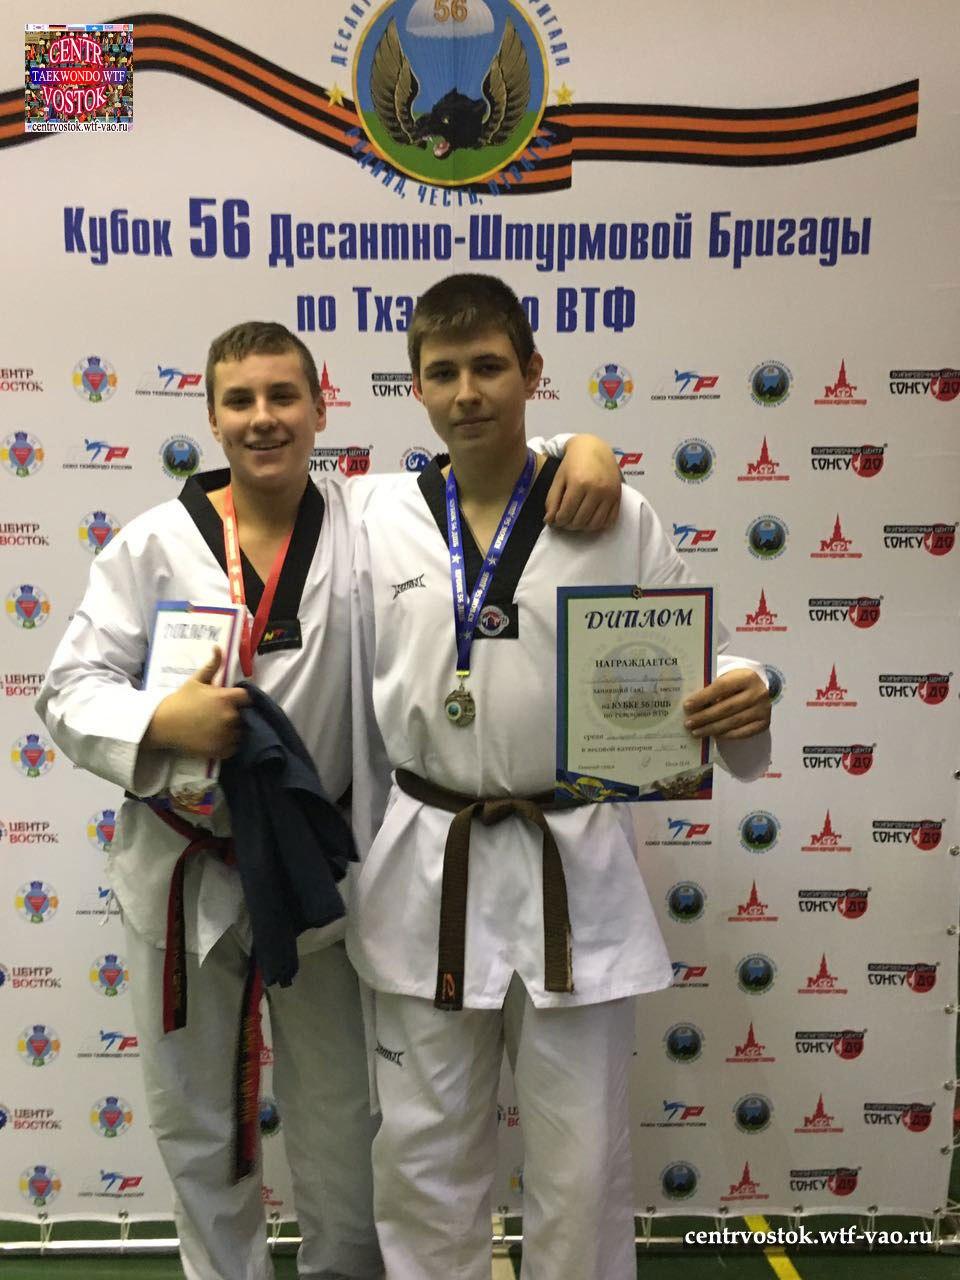 Kubok_DSHB_2016_Male_78kg